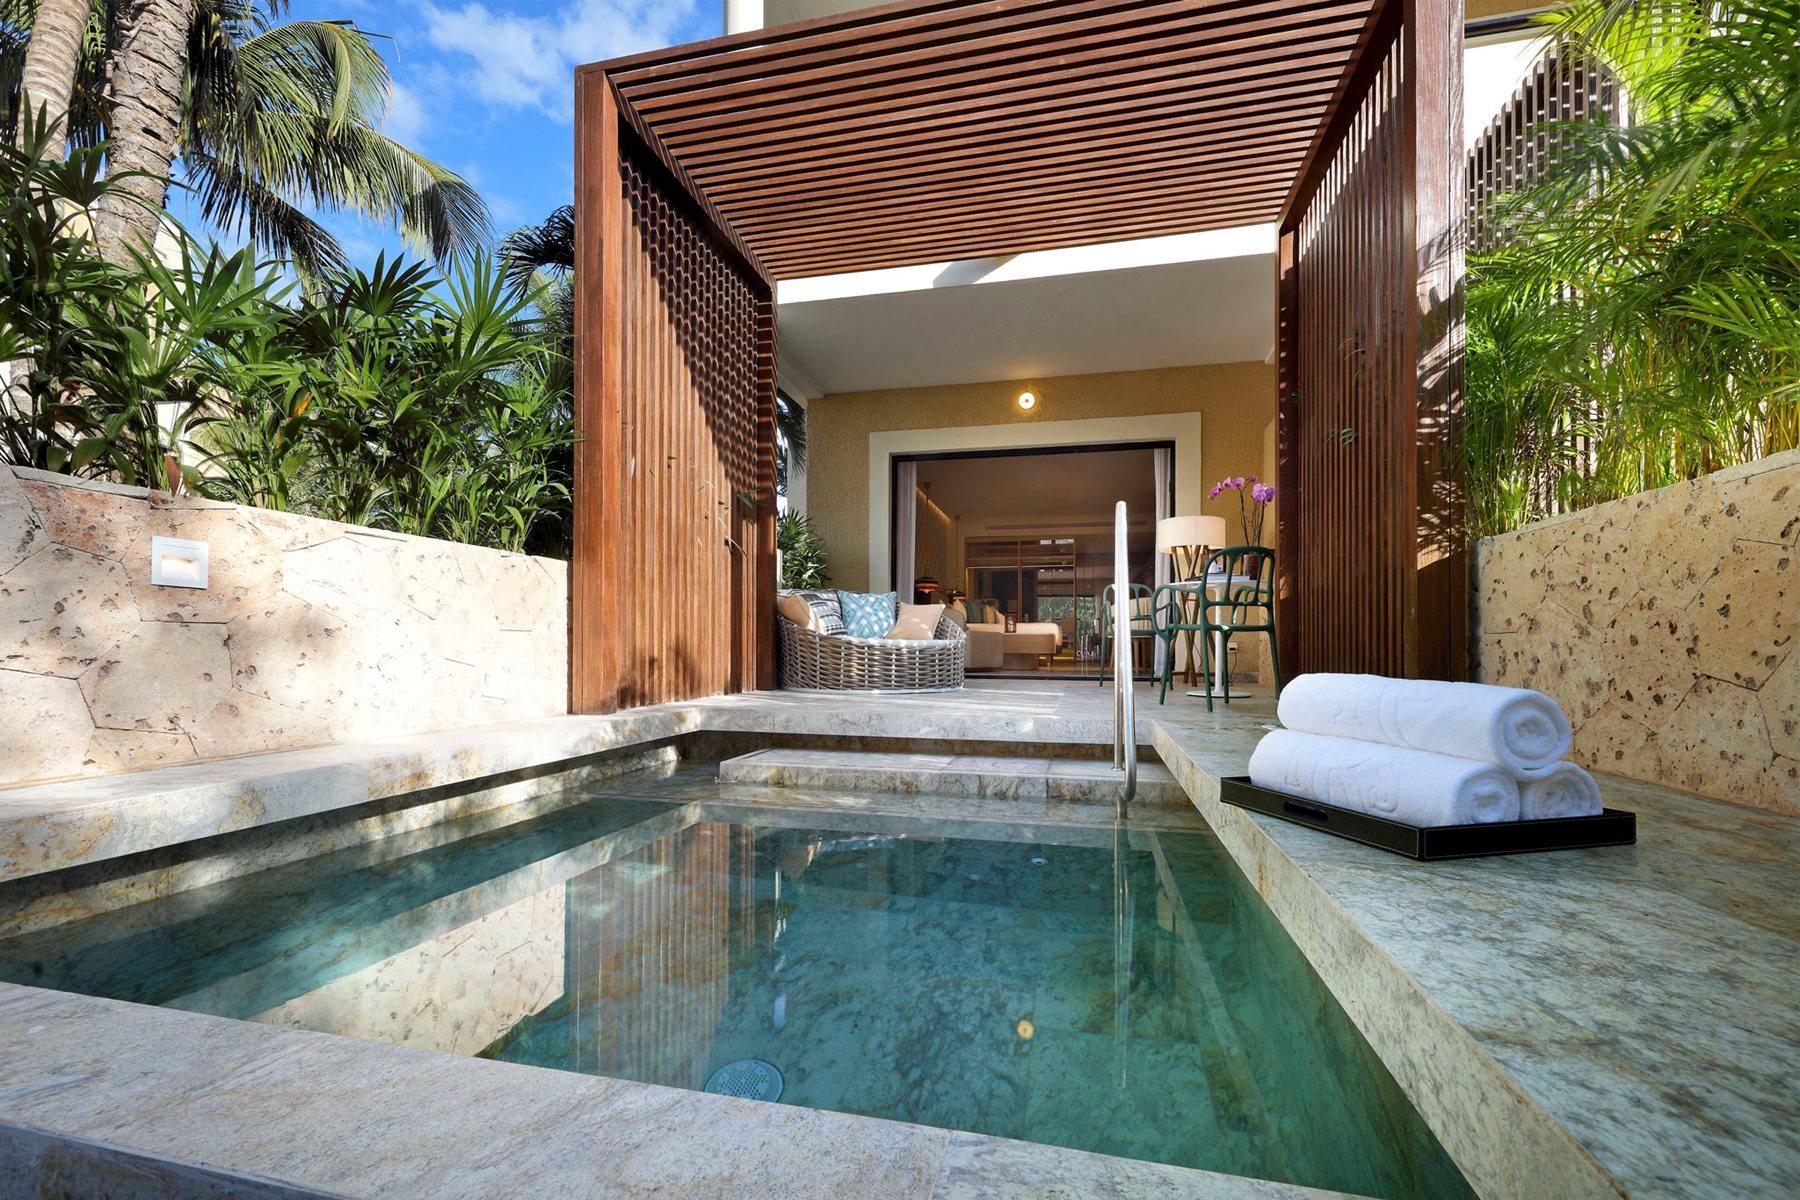 RIV-TRS-Yucatan-Room-Junior-Suite-Garden-View-Private-Pool-001 (1)